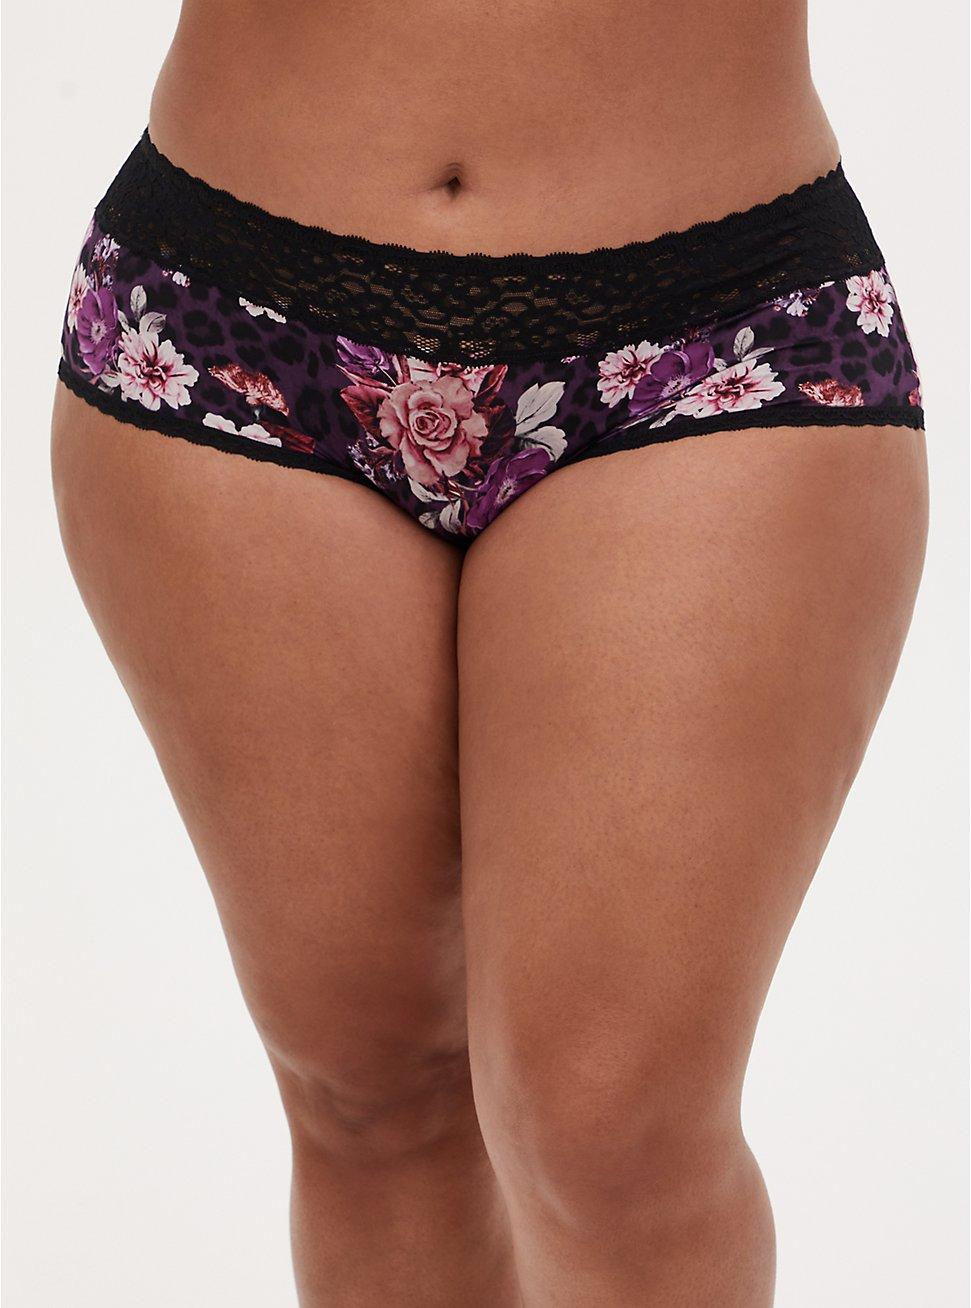 Purple Leopard Floral Second Skin Cheeky Panty , LEOPARD FLORAL PURPLE, hi-res